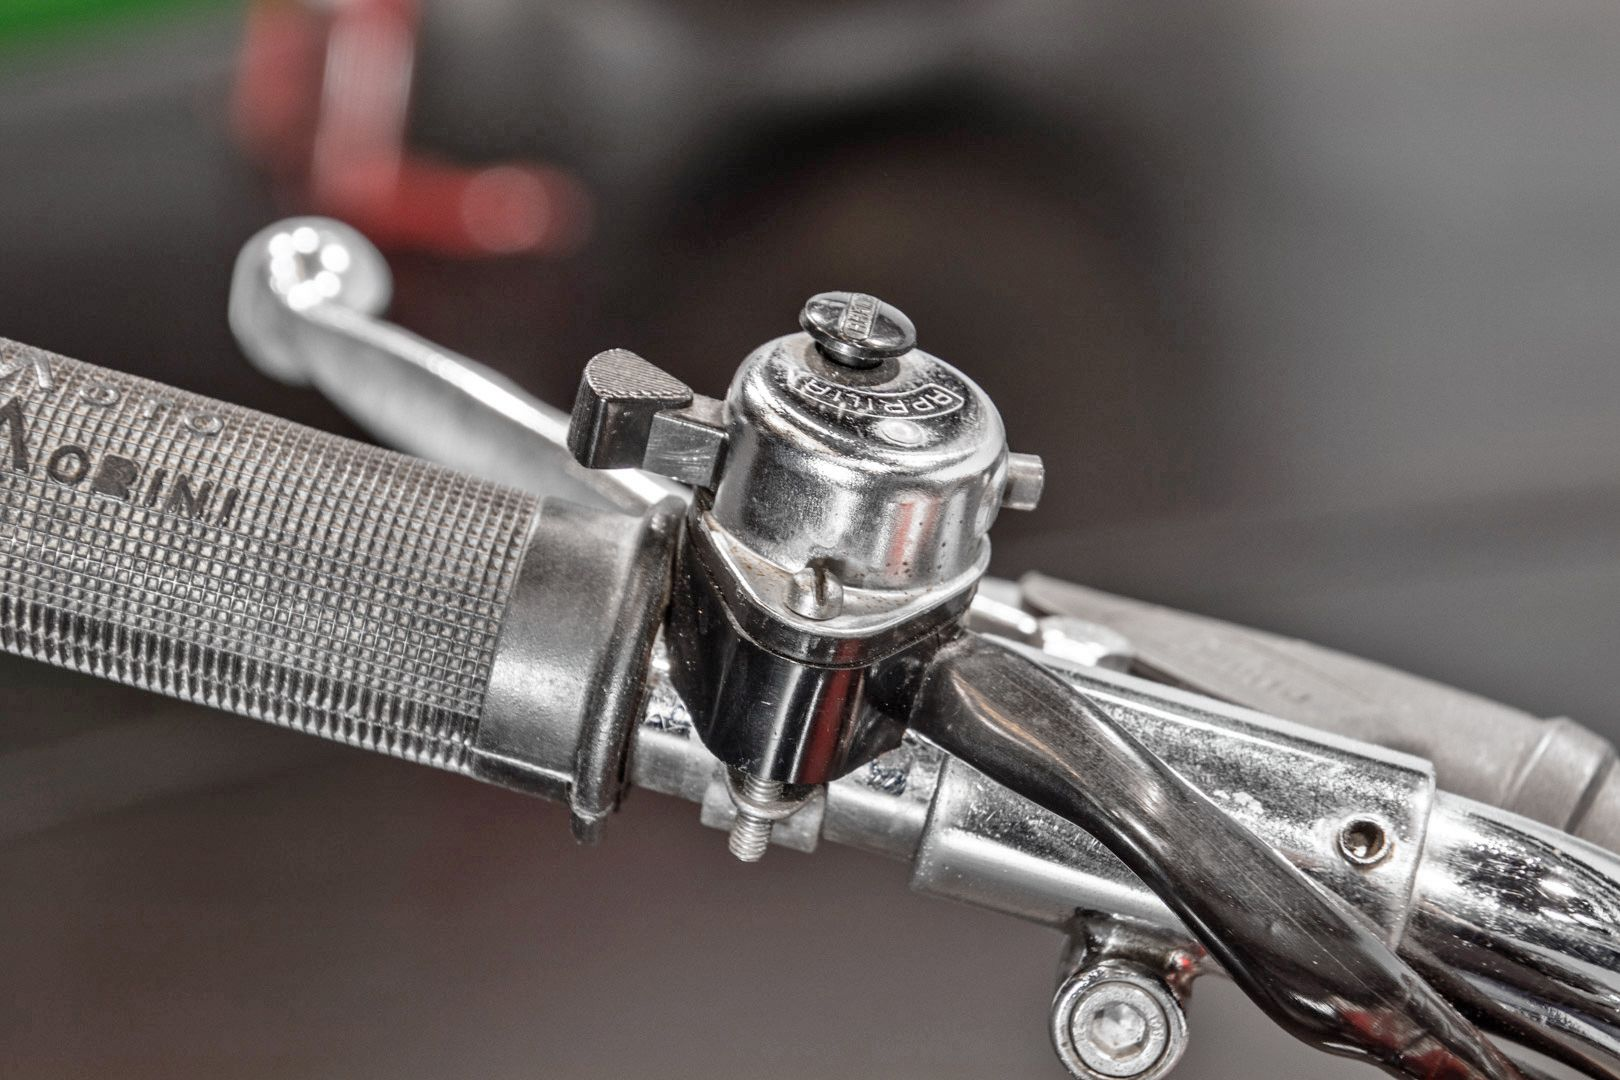 1959 Moto Morini Corsaro 125 37764